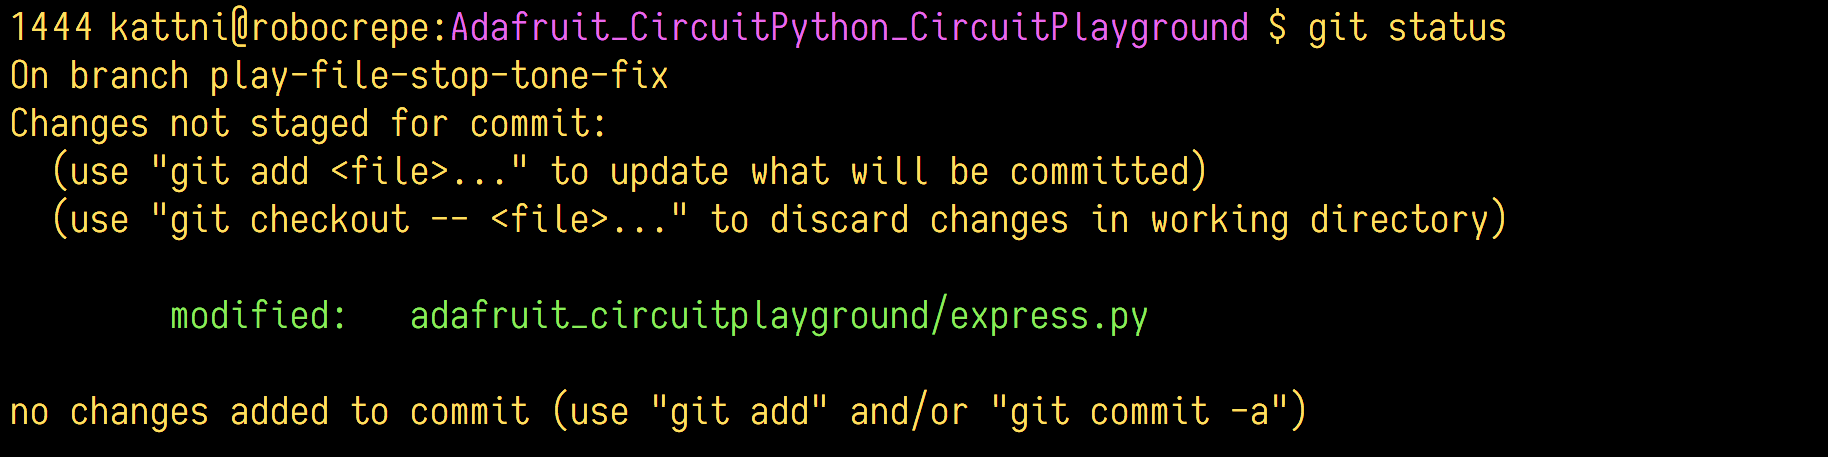 circuitpython_GitStatusBeforeAdd.png